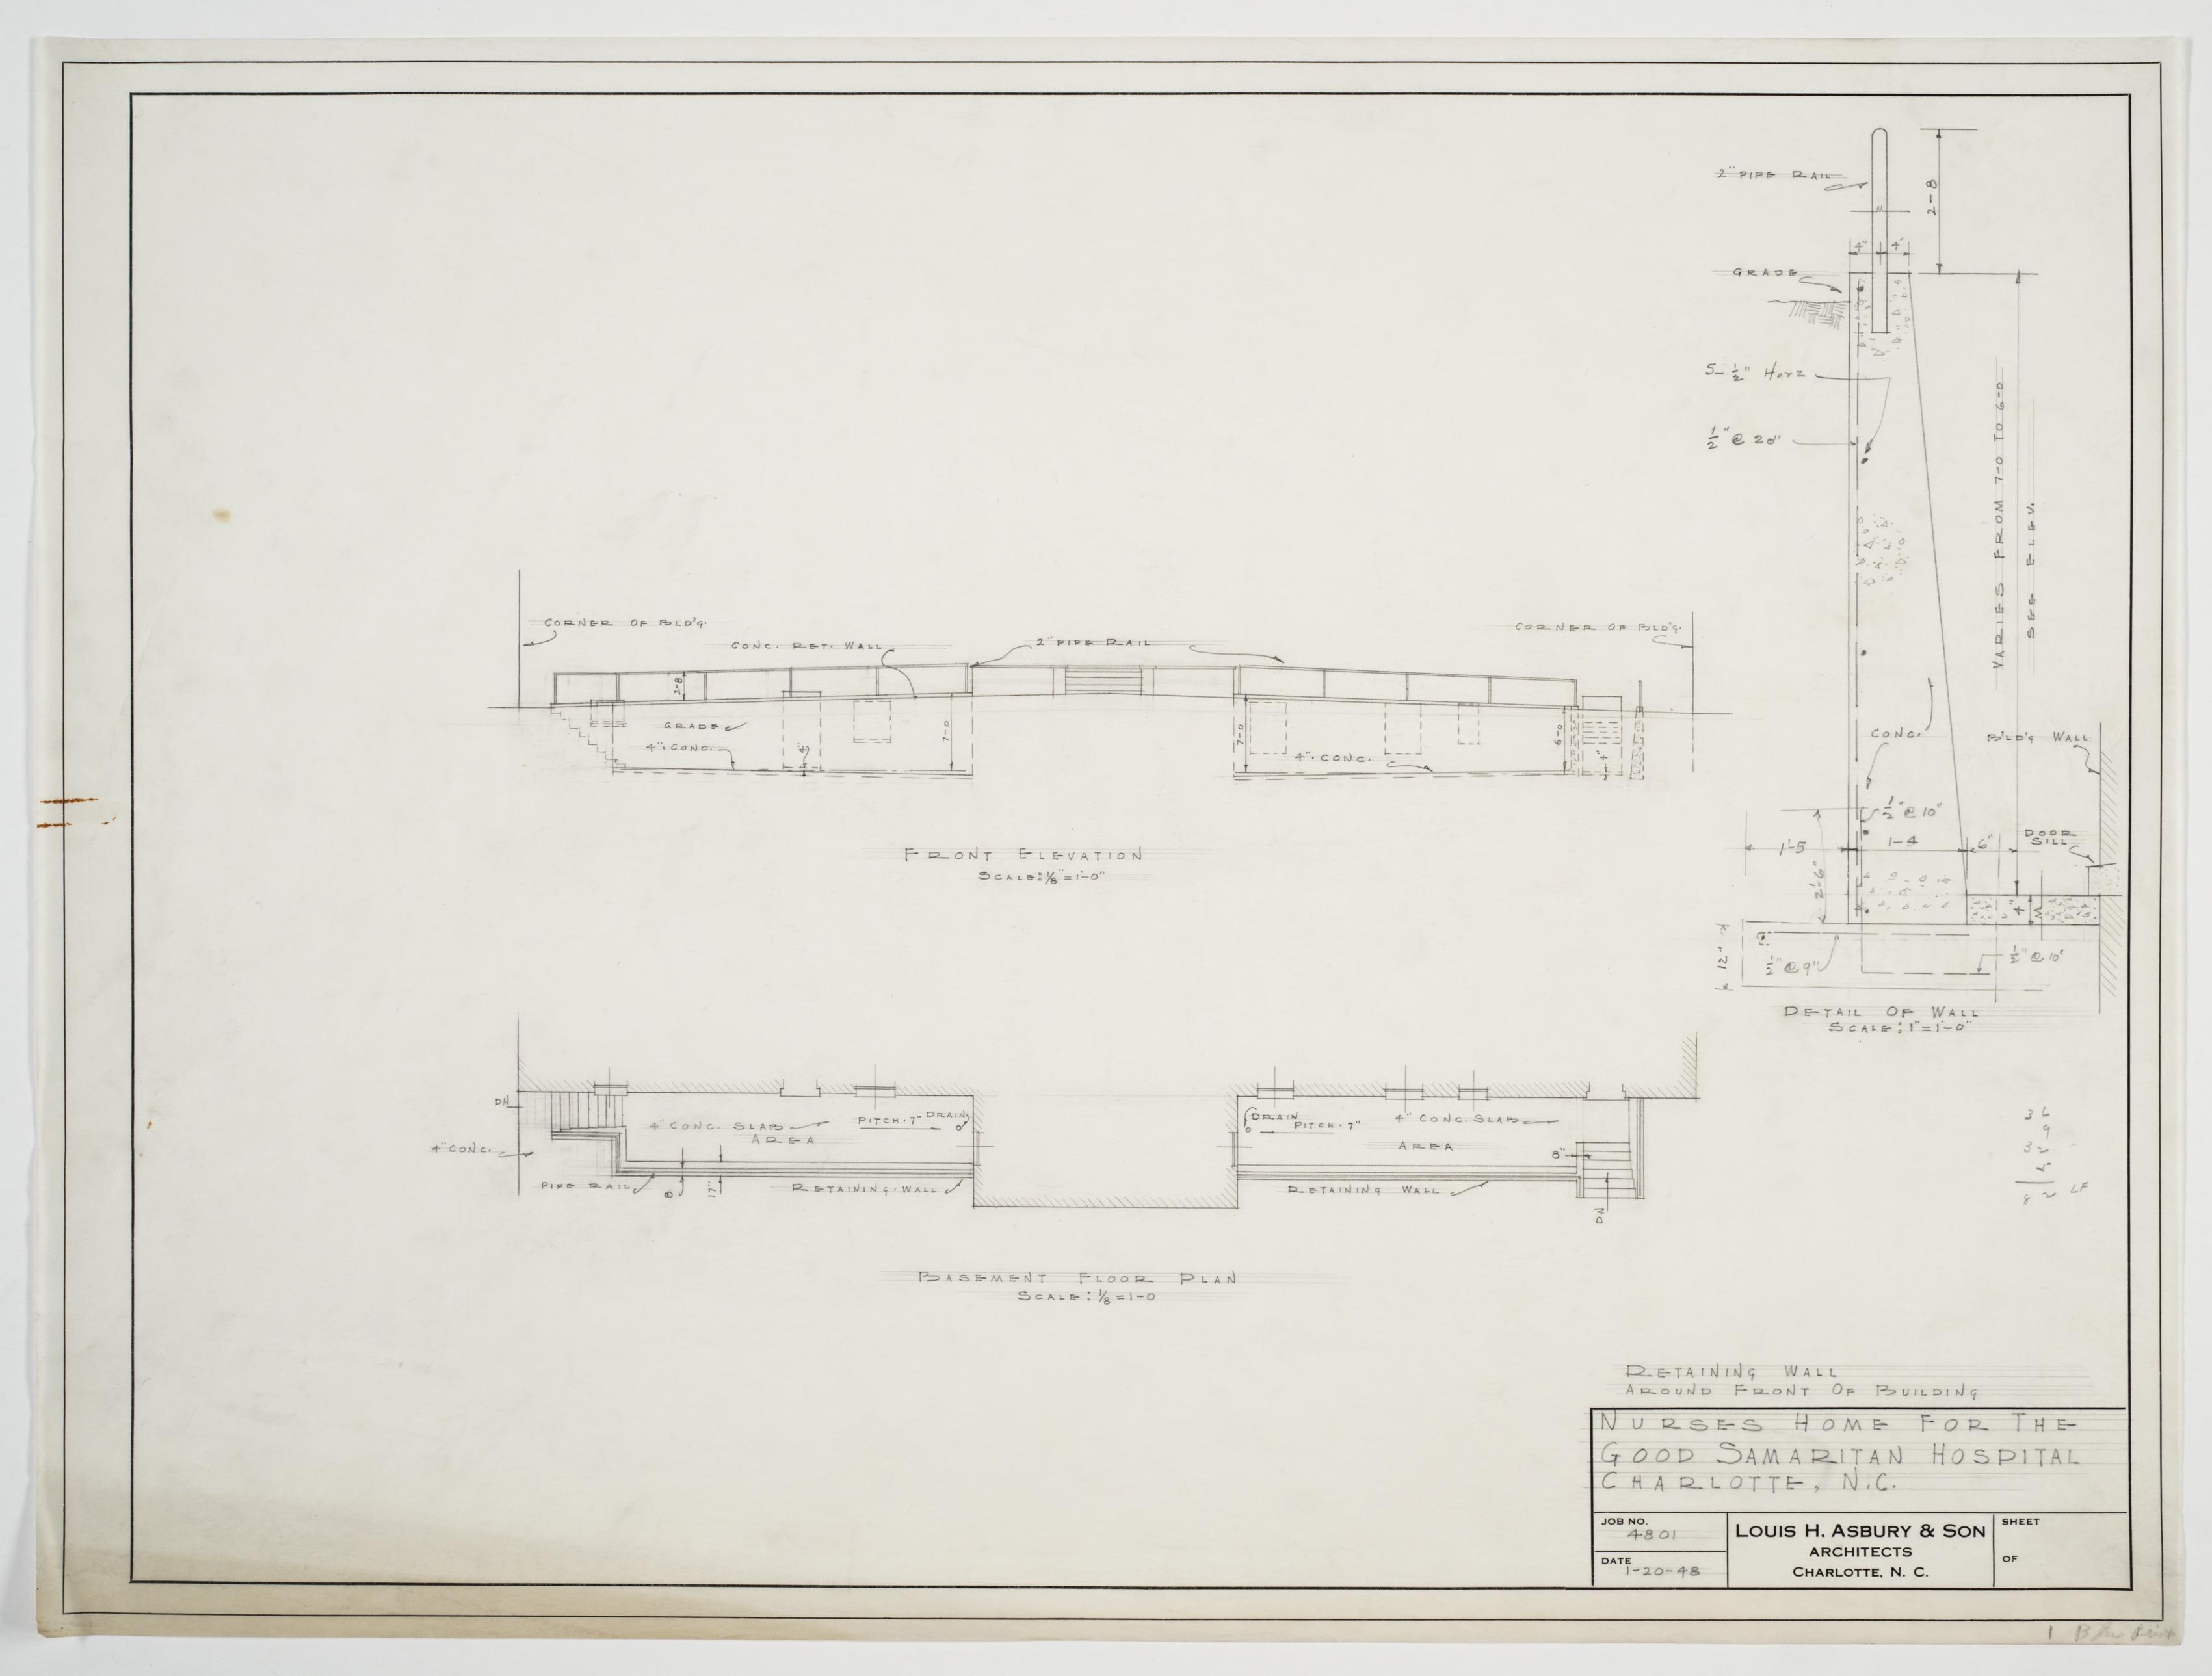 Stone Wall Elevation Drawing : Retaining wall plan elevation and detail good samaritan